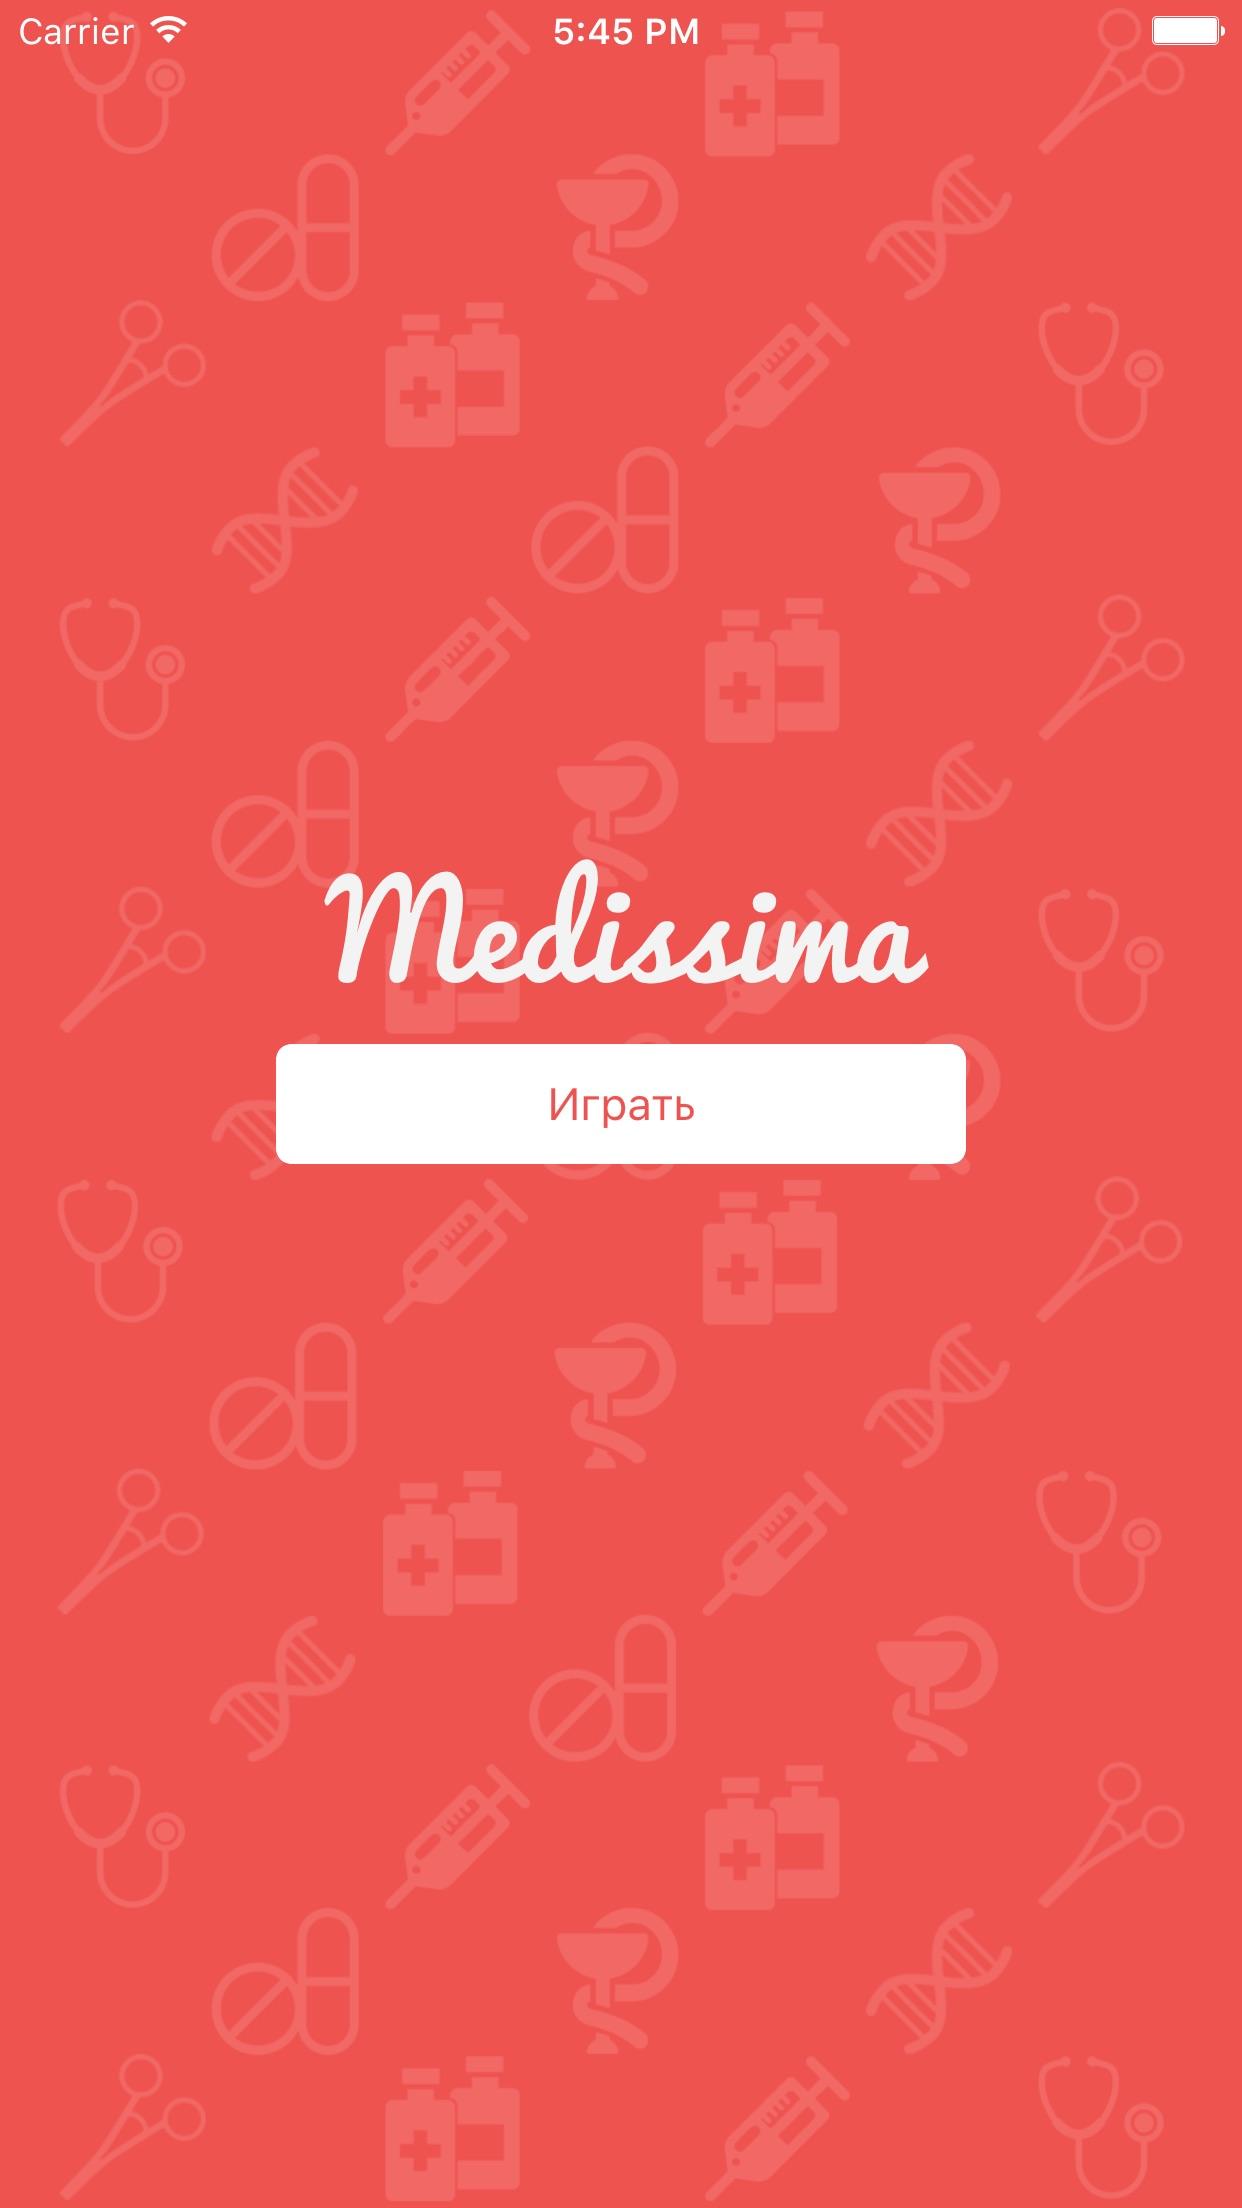 Medissima Screenshot